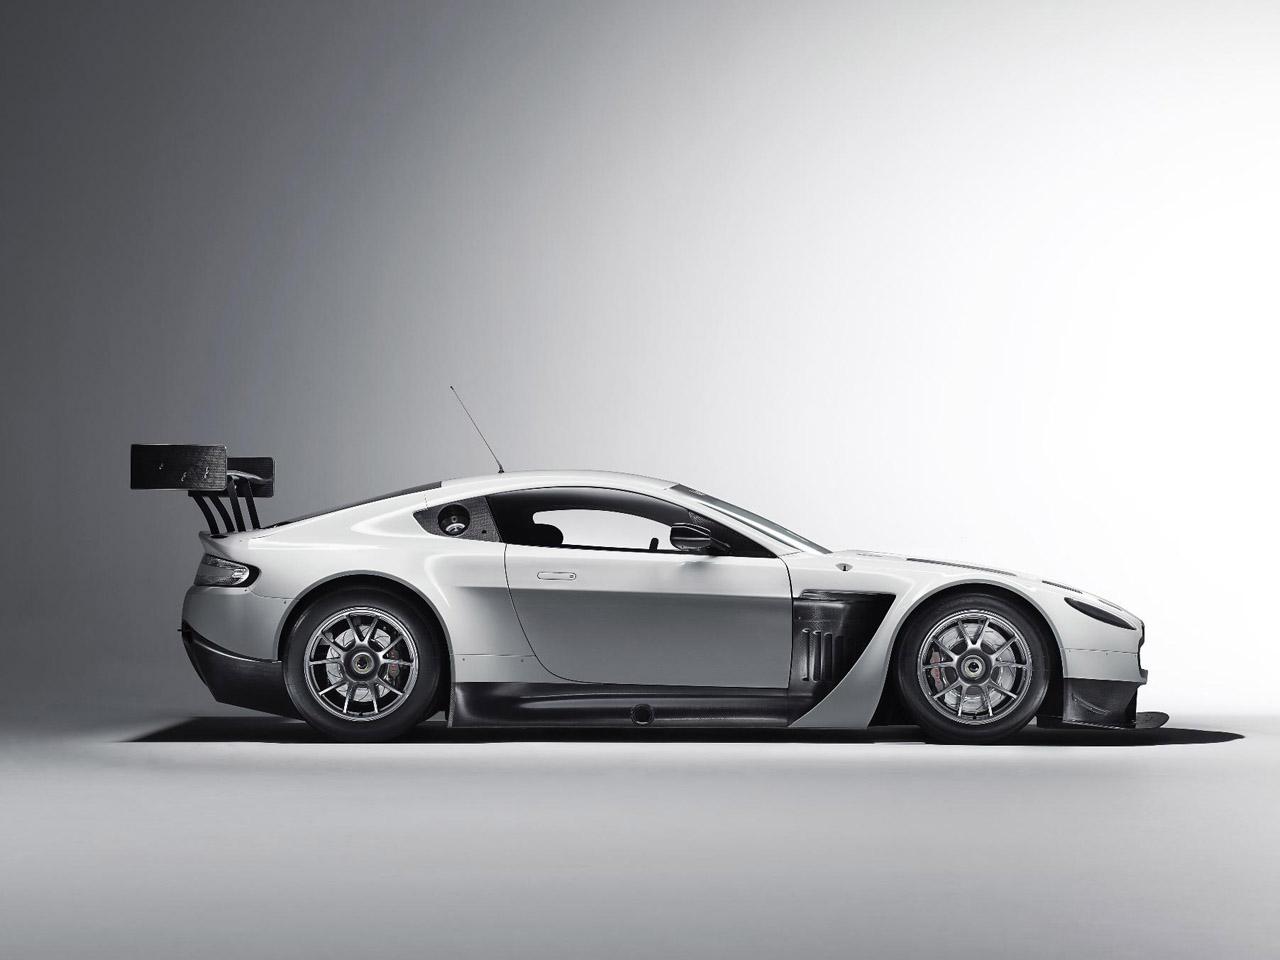 Aston Martin V12 Vantage GT3 Photo Gallery - Autoblog